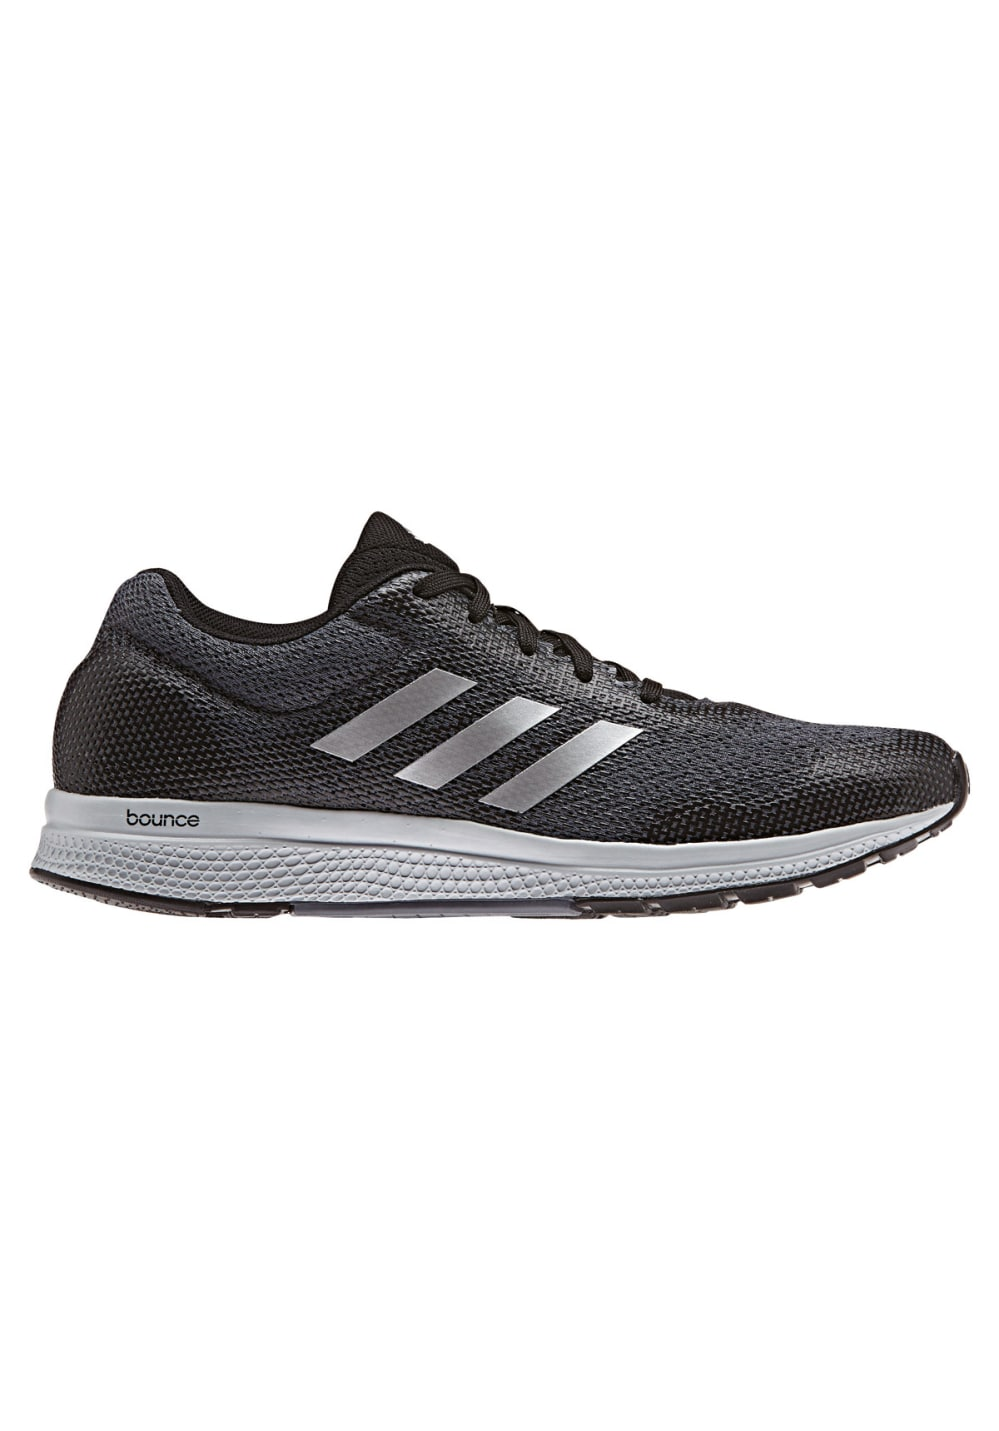 nouvelle arrivee ad682 a22a5 adidas Mana Bounce 2 Aramis - Chaussures running pour Femme - Noir